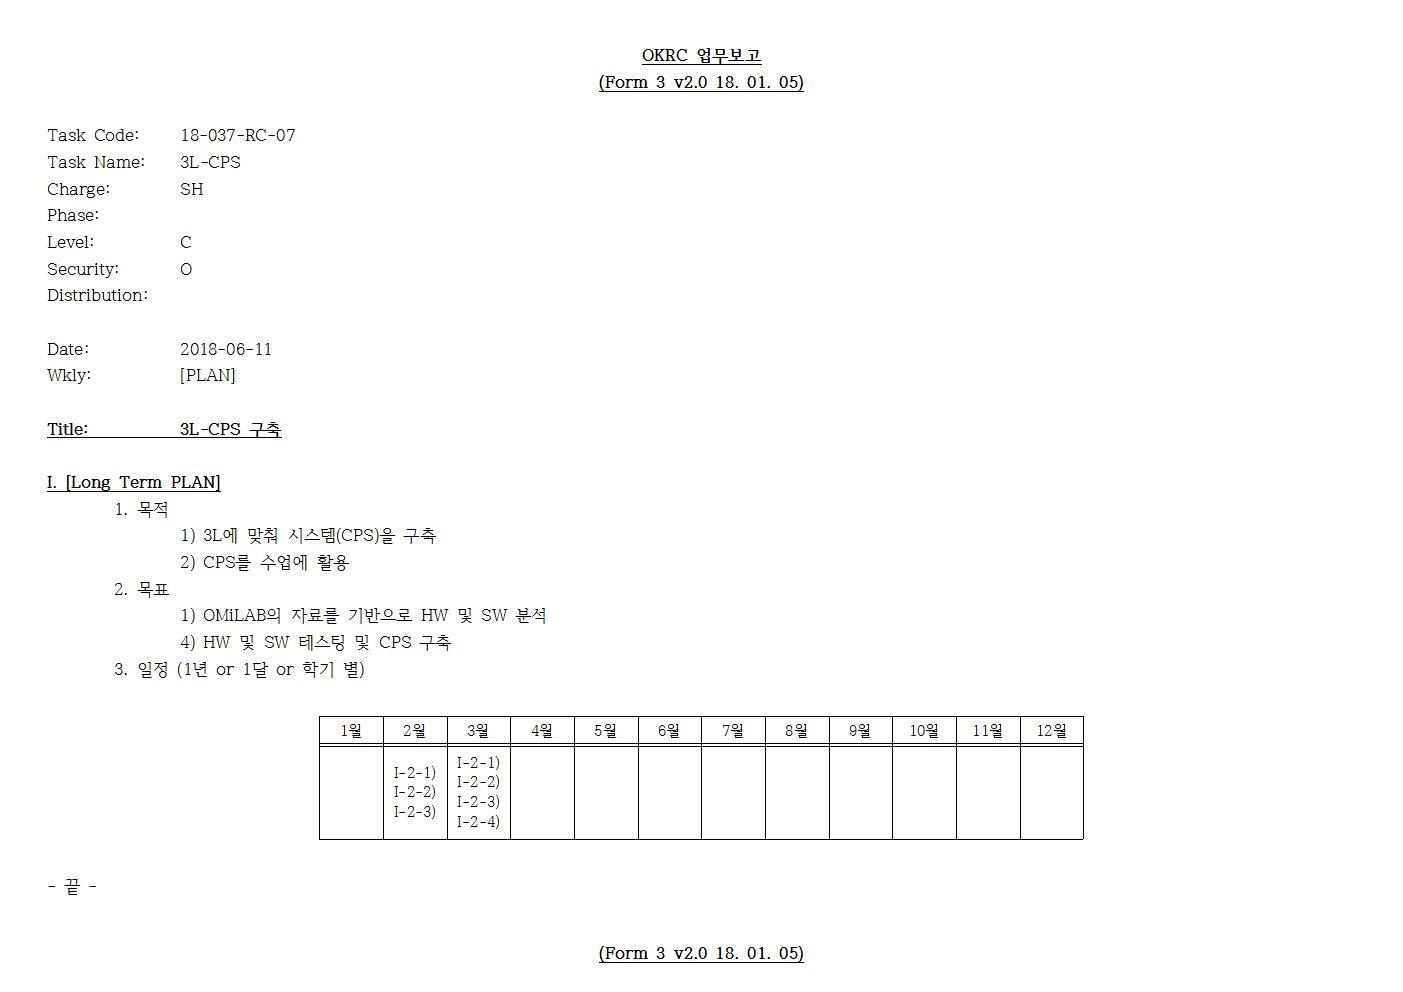 D-[18-037-RC-07]-[3L-CPS]-[2018-06-11][SH]001.jpg